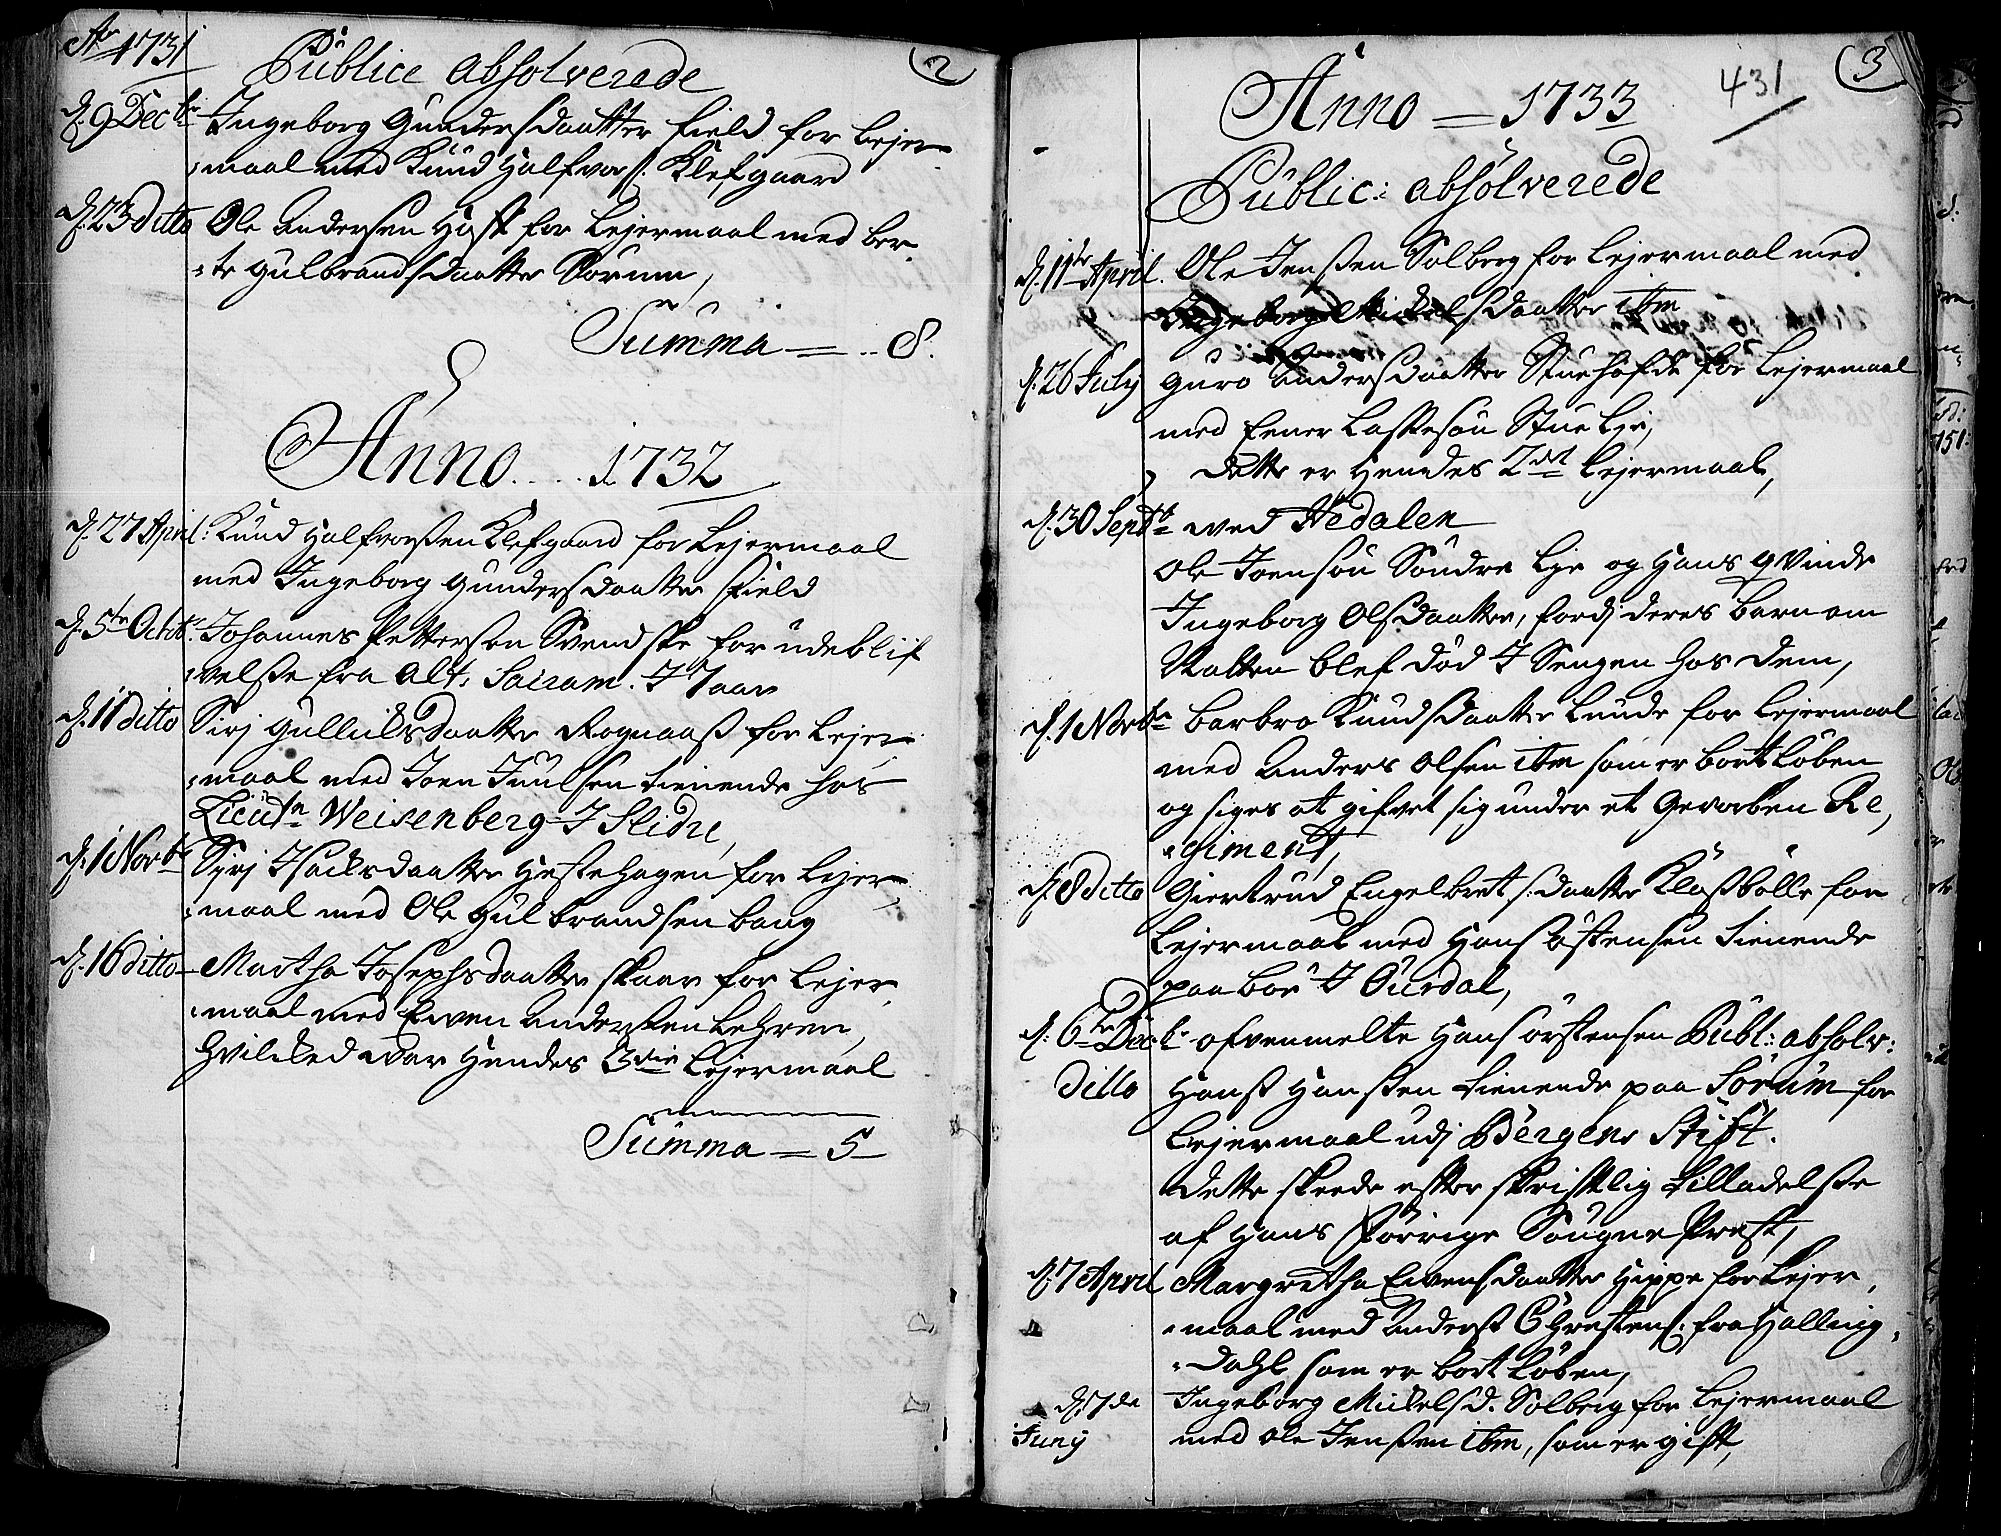 SAH, Aurdal prestekontor, Ministerialbok nr. 4, 1730-1762, s. 2-3